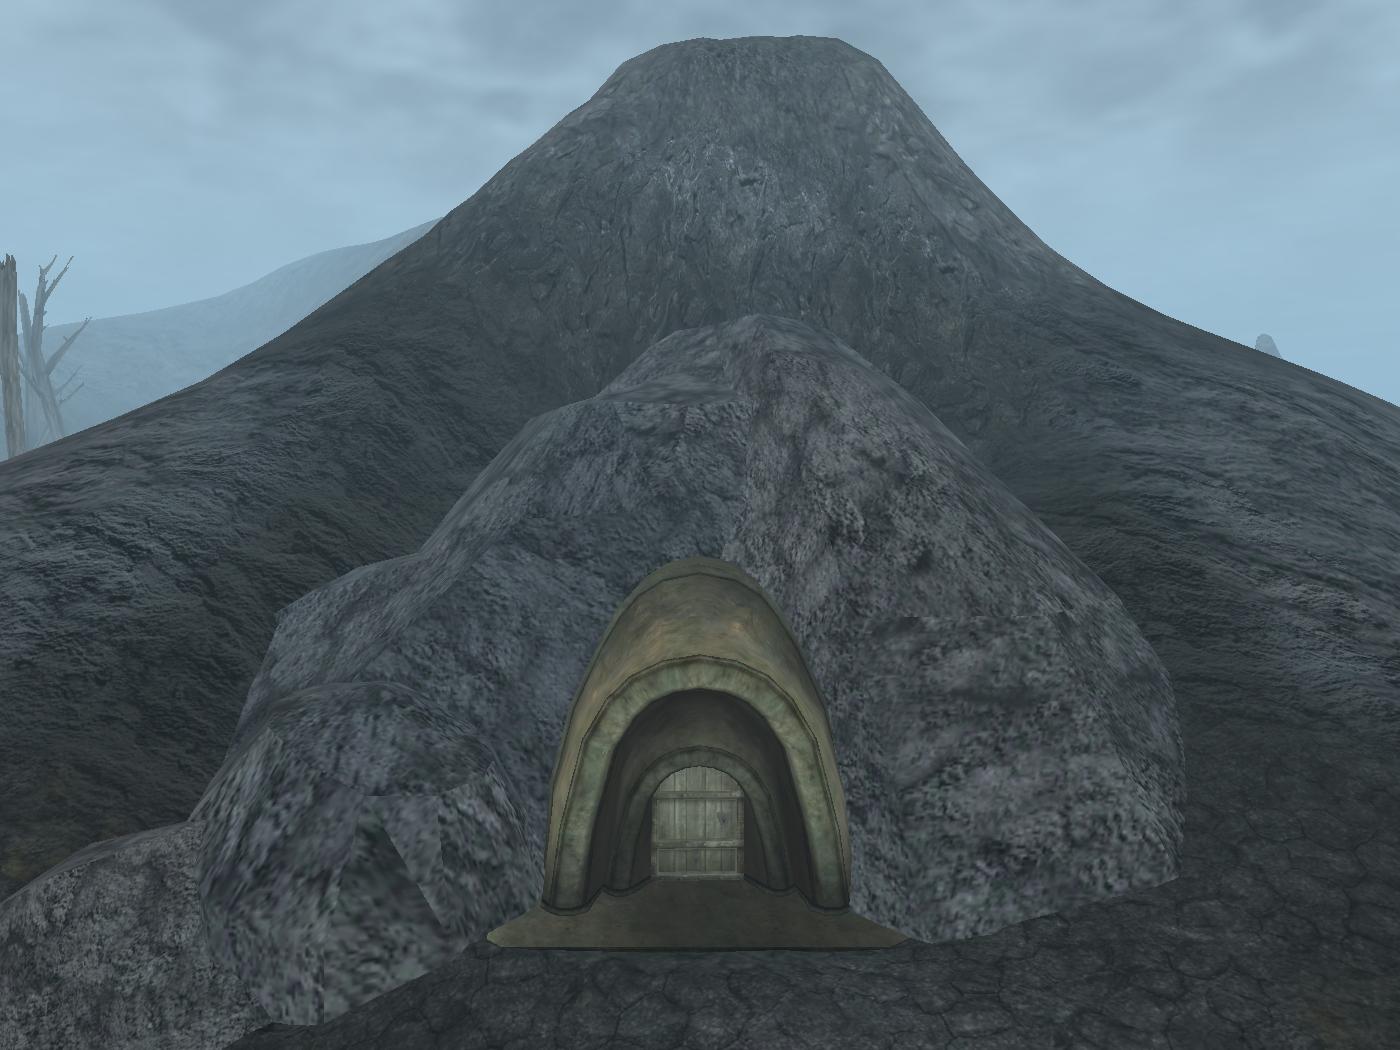 Aran Ancestral Tomb (Morrowind)